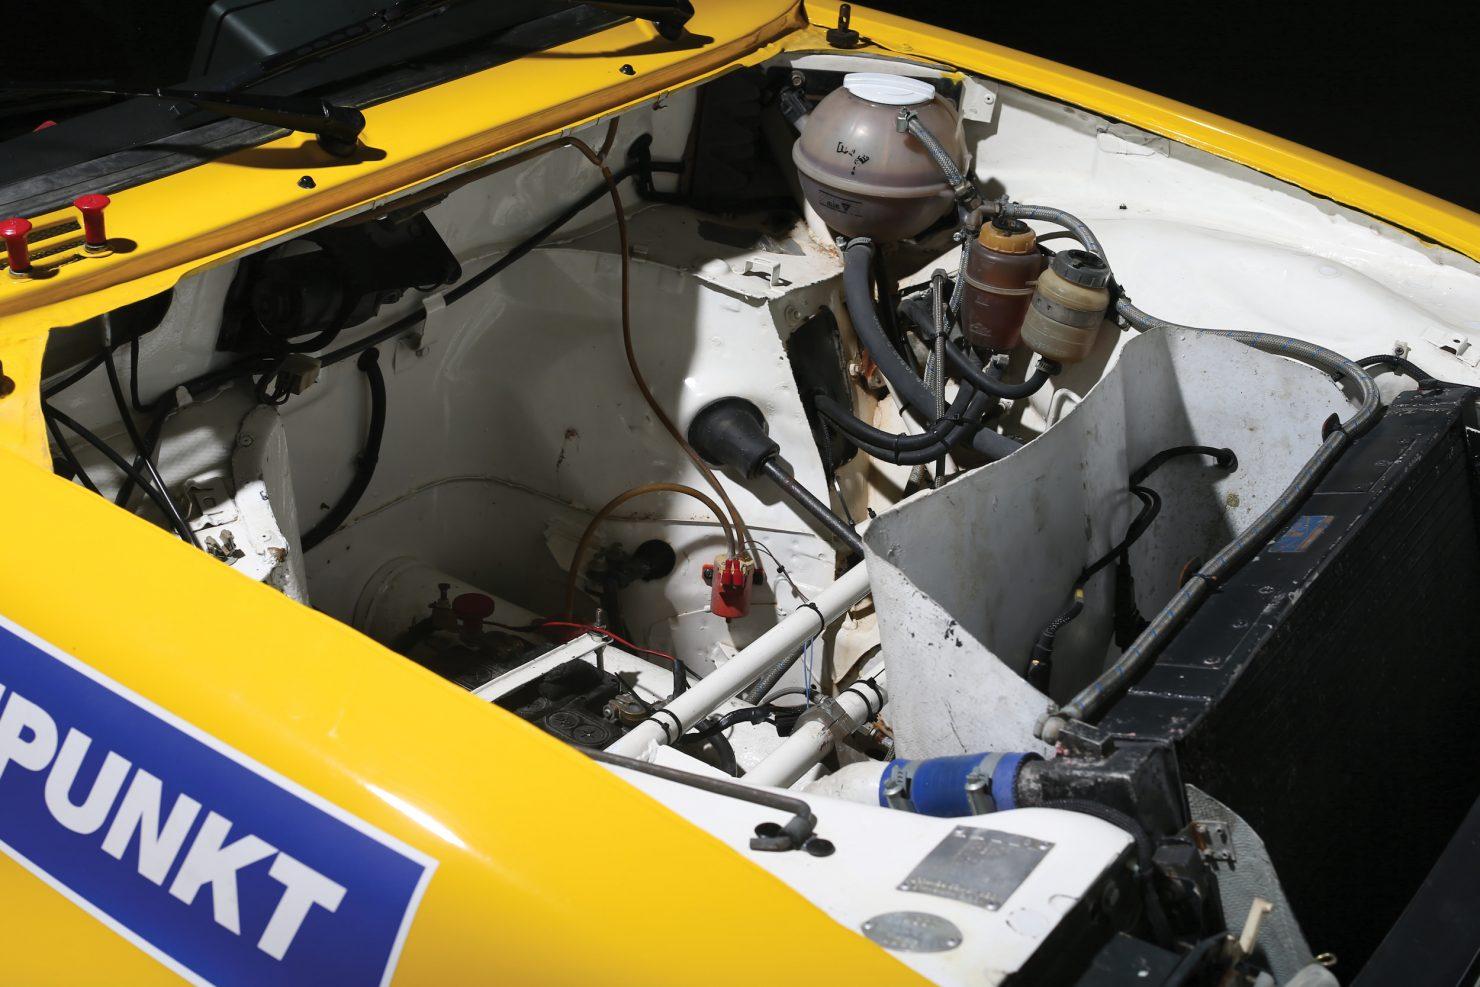 Renault 5 Turbo 14 1480x987 - 1980 Renault 5 Turbo